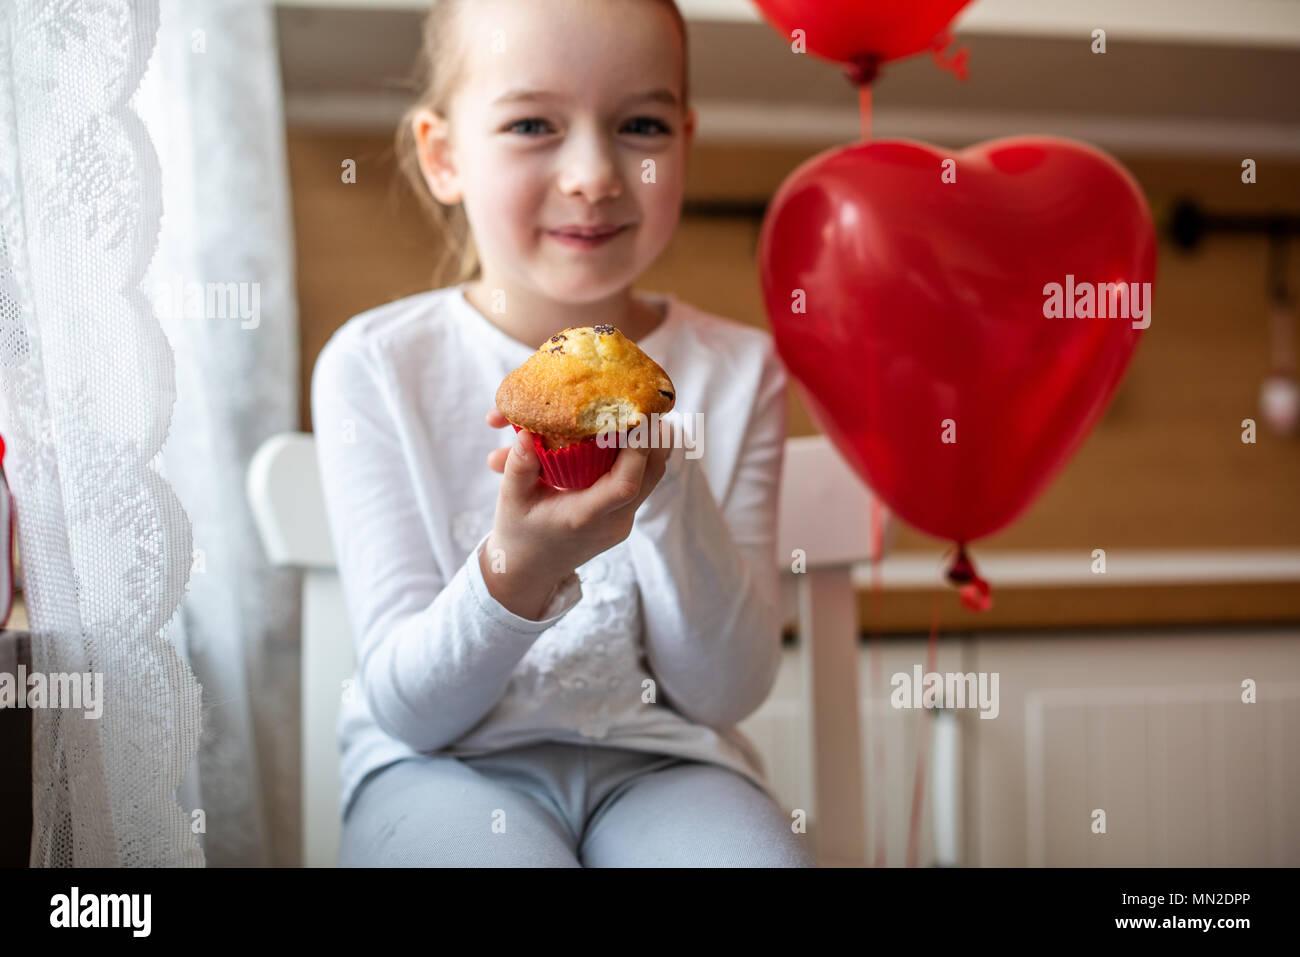 Cute girl bambin célébrer 6e anniversaire. Girl eating her birthday cupcake dans la cuisine, entouré par des ballons. Photo Stock